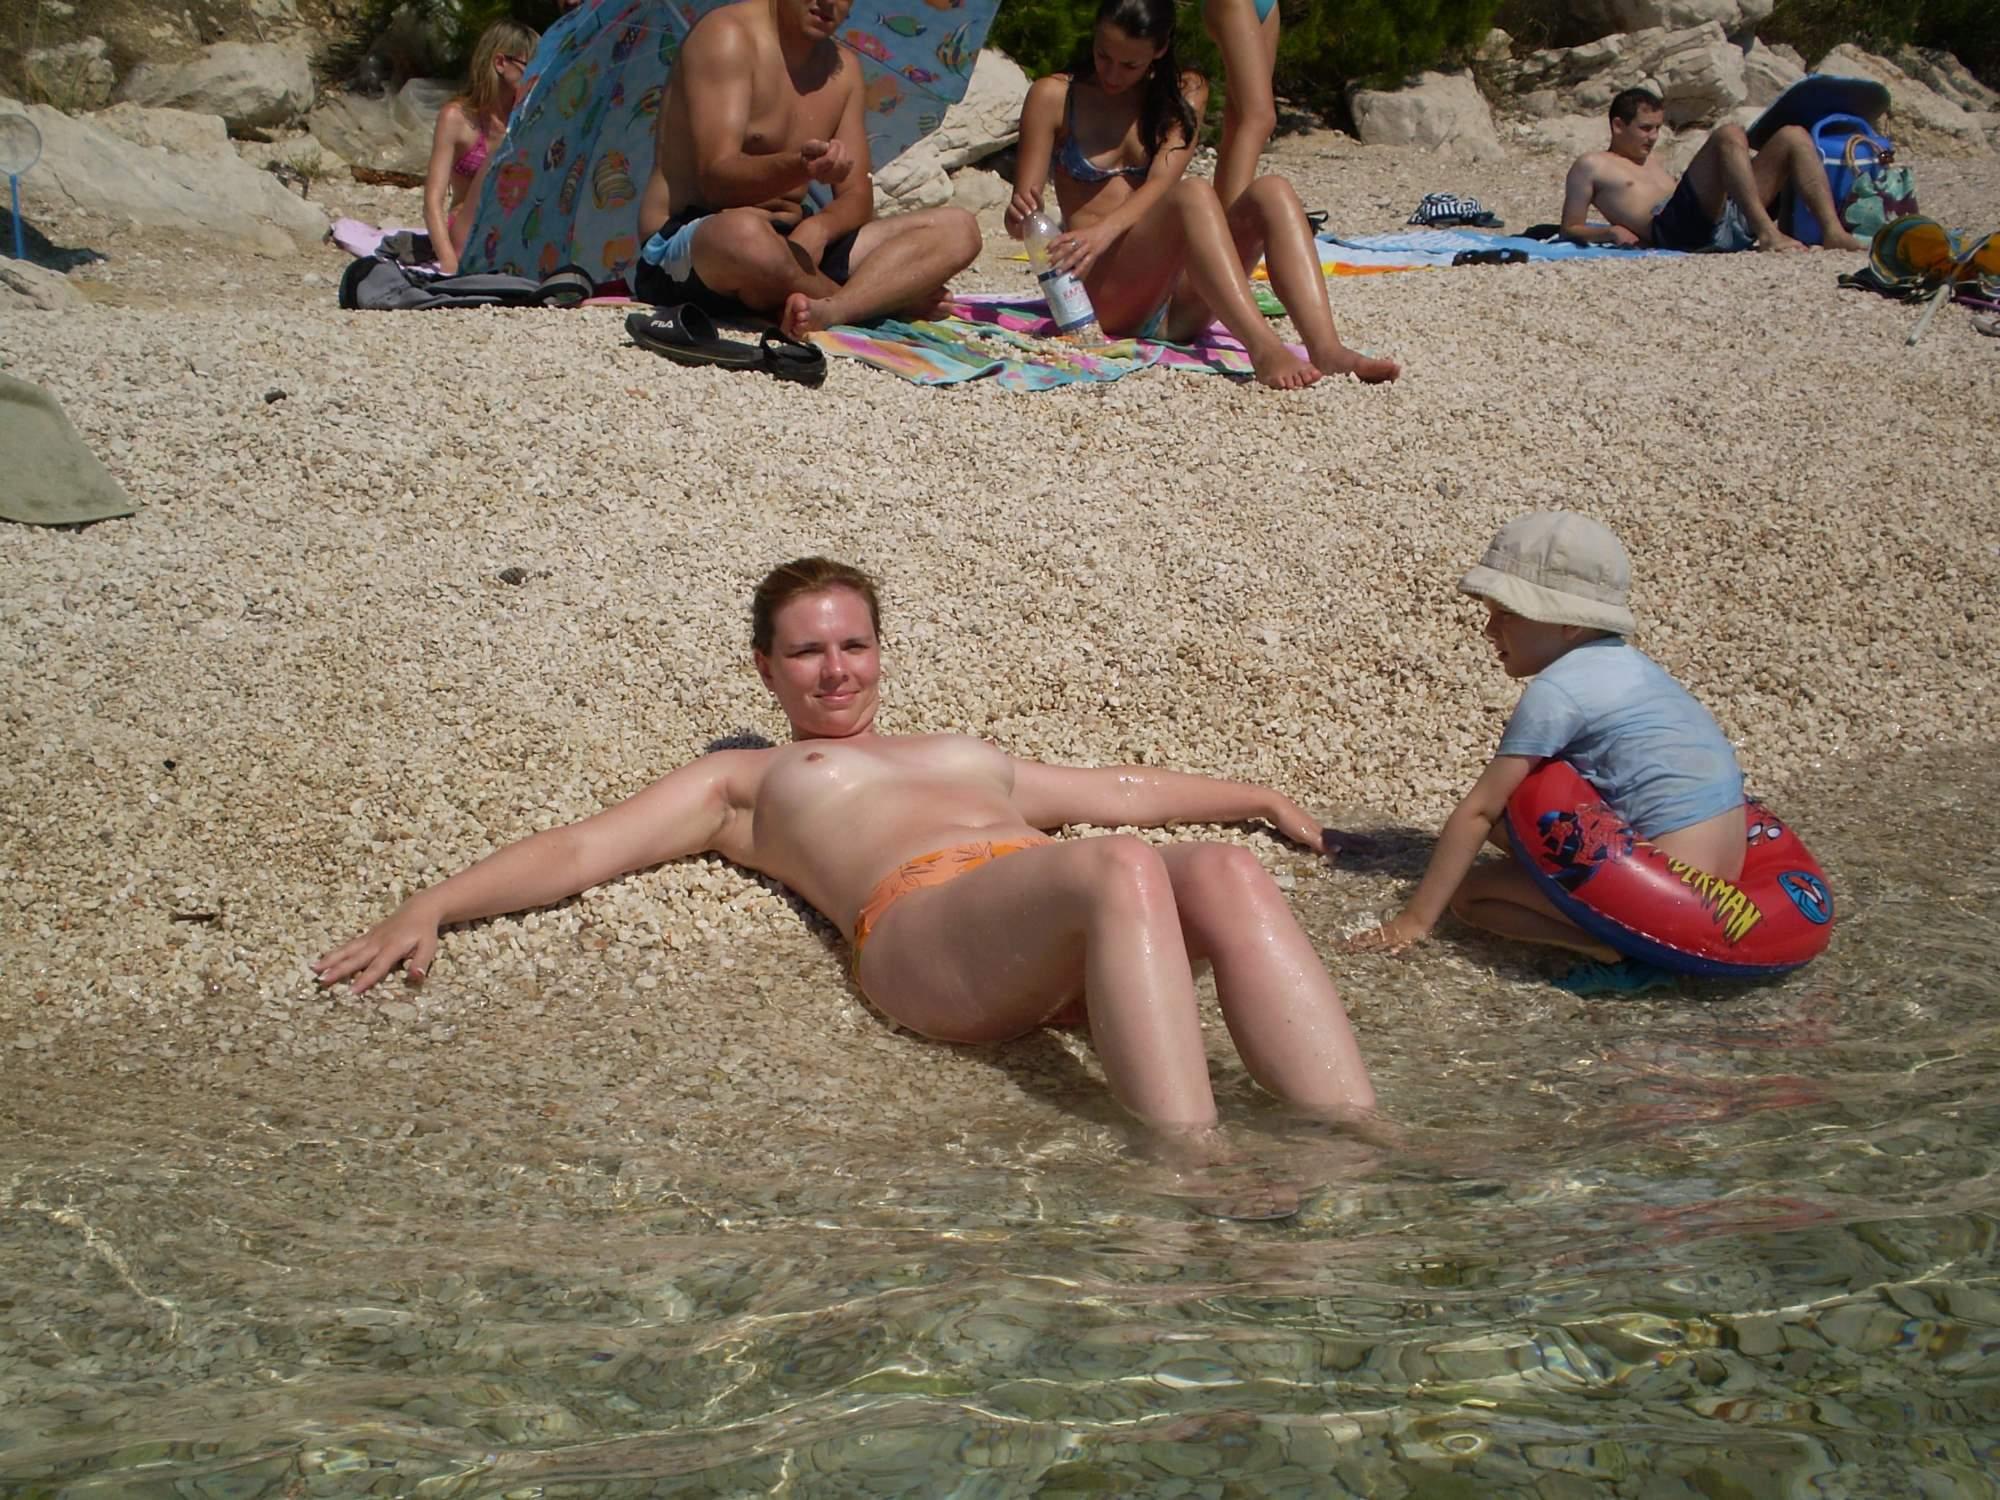 rajce naked butt rajce naked butt 1rajce.idnes. Chorvatsko naked Chorvatsko naked 1 rajce .idnes.